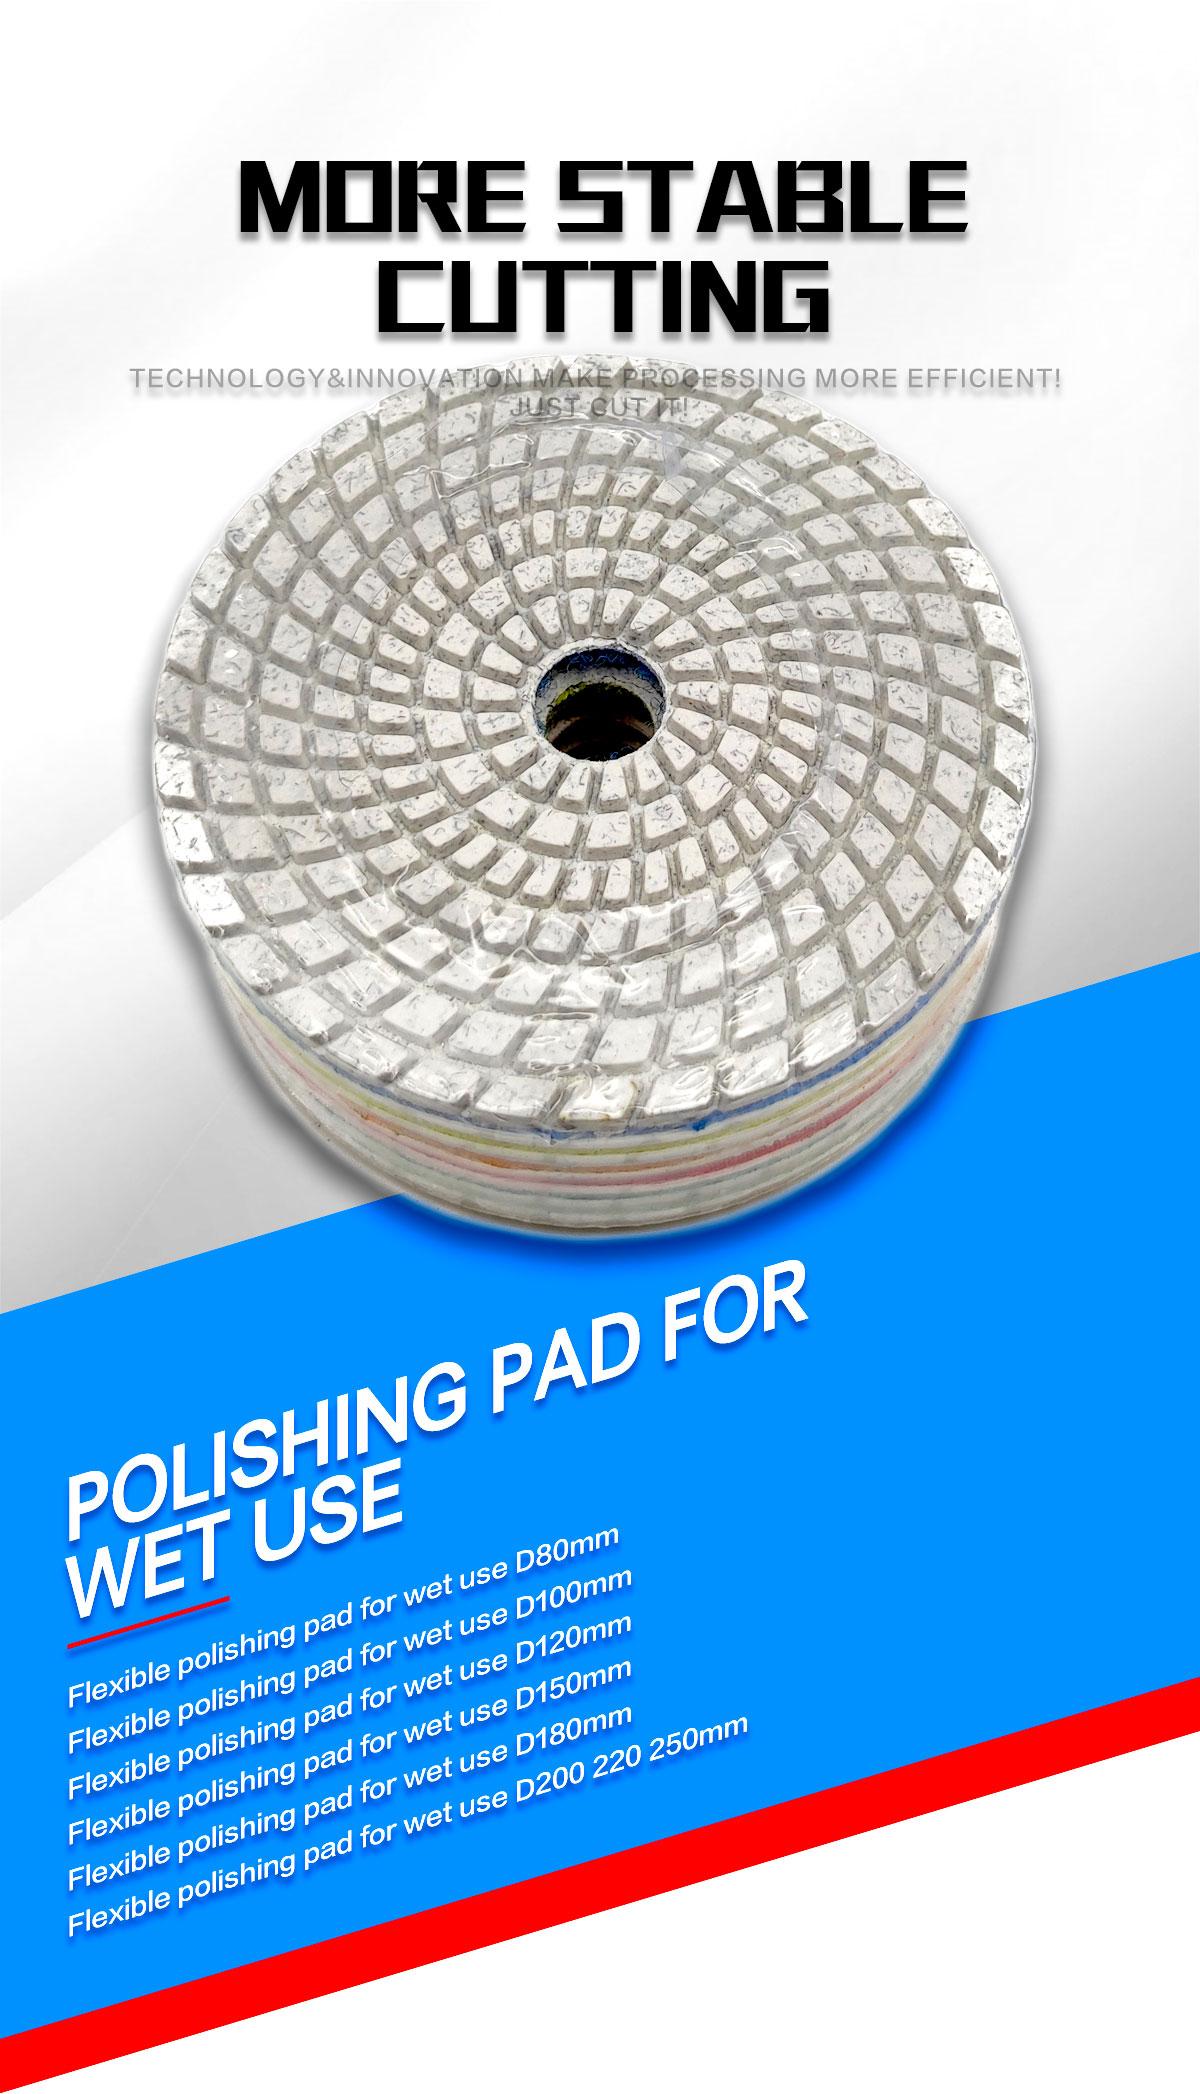 polishing pad for wet use